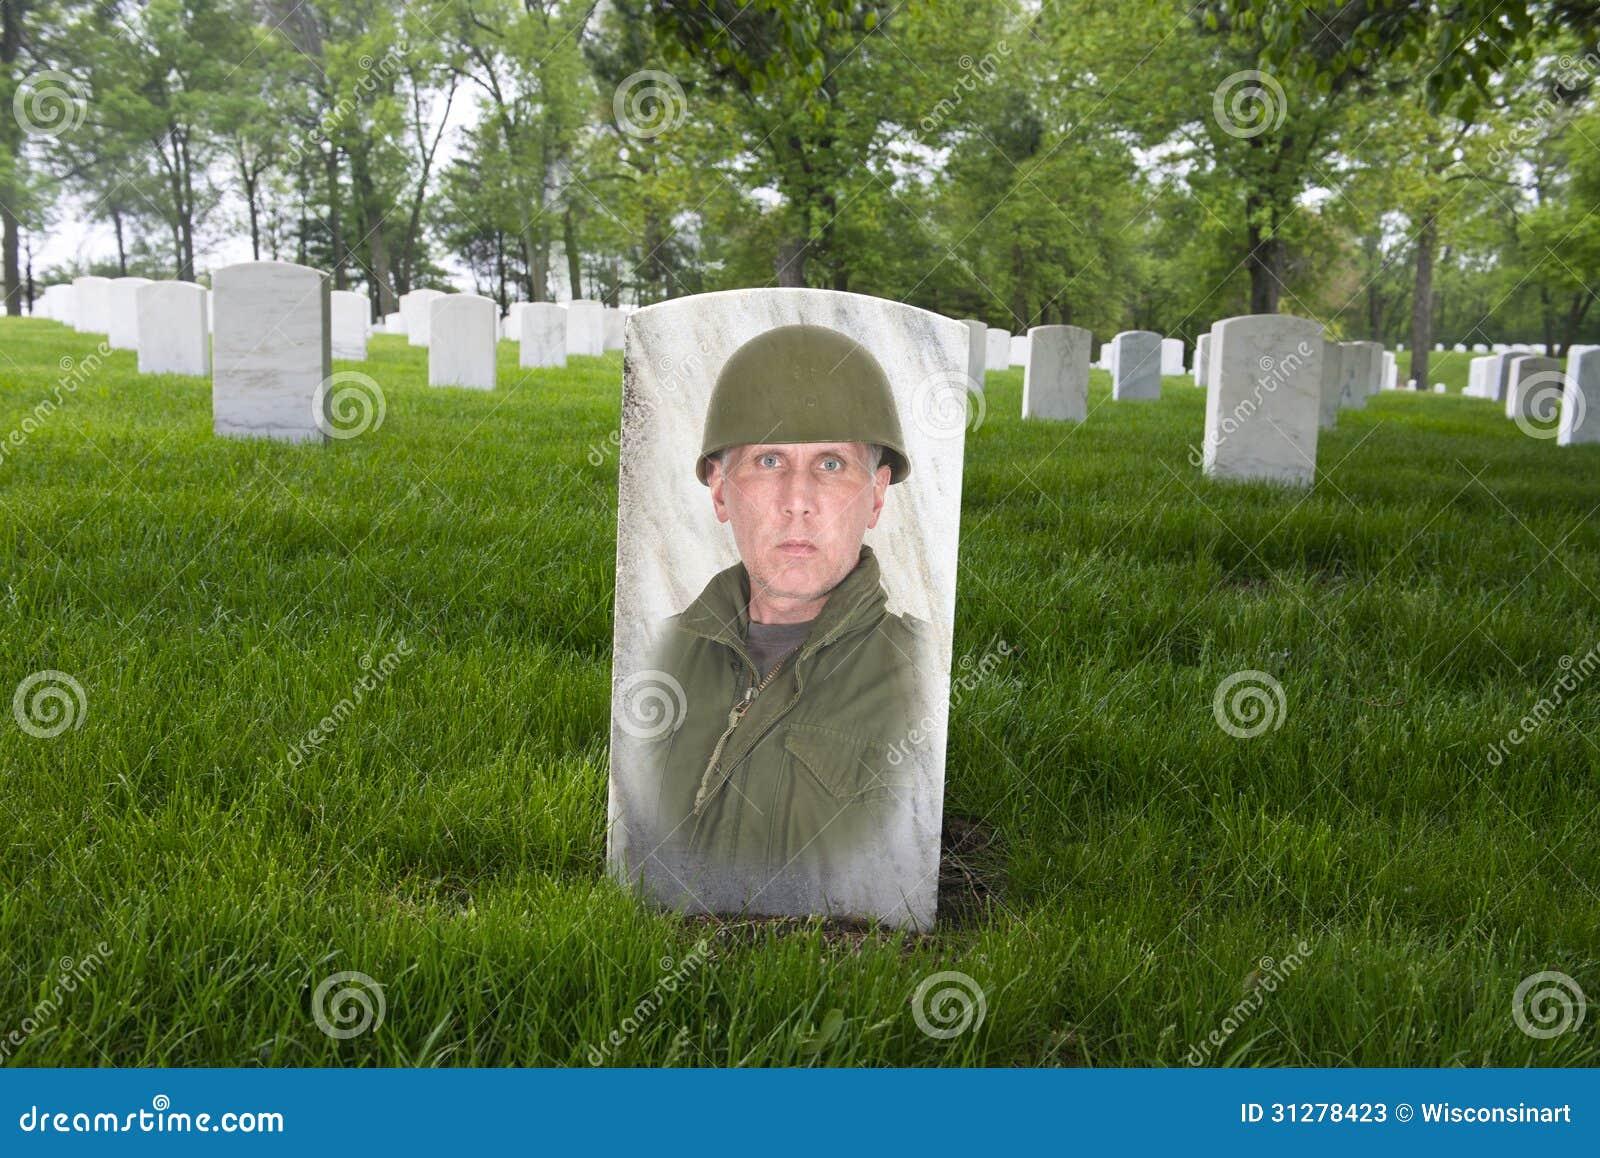 Memorial Day War Veteran Cemetery Army Solider Stock